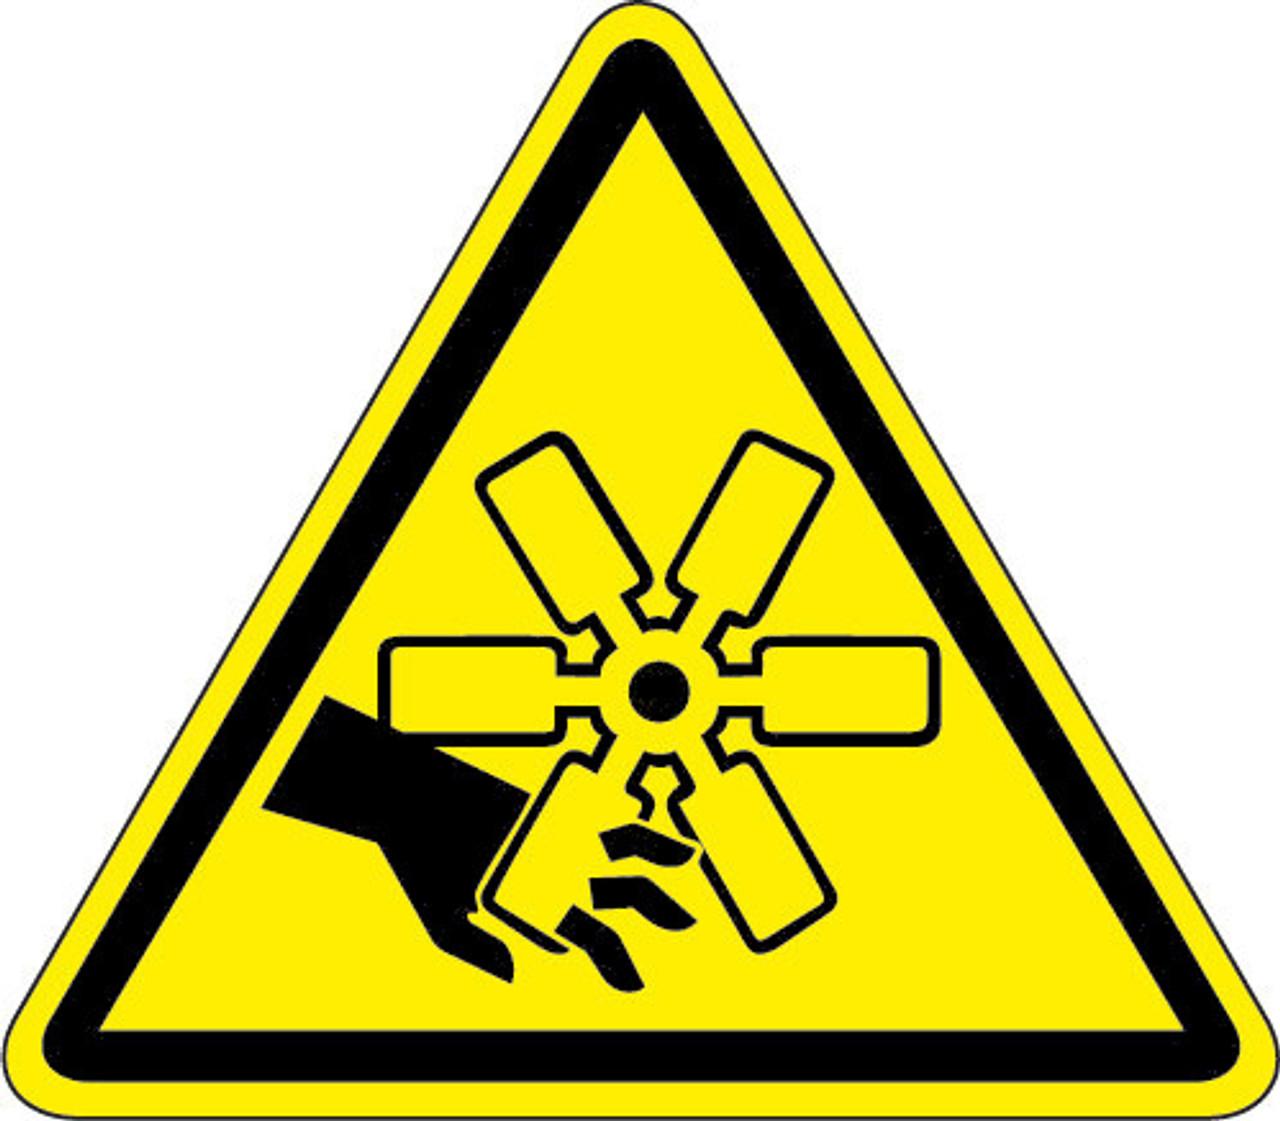 Cut Or Crush Hazard (ISO Triangle Hazard Symbol)